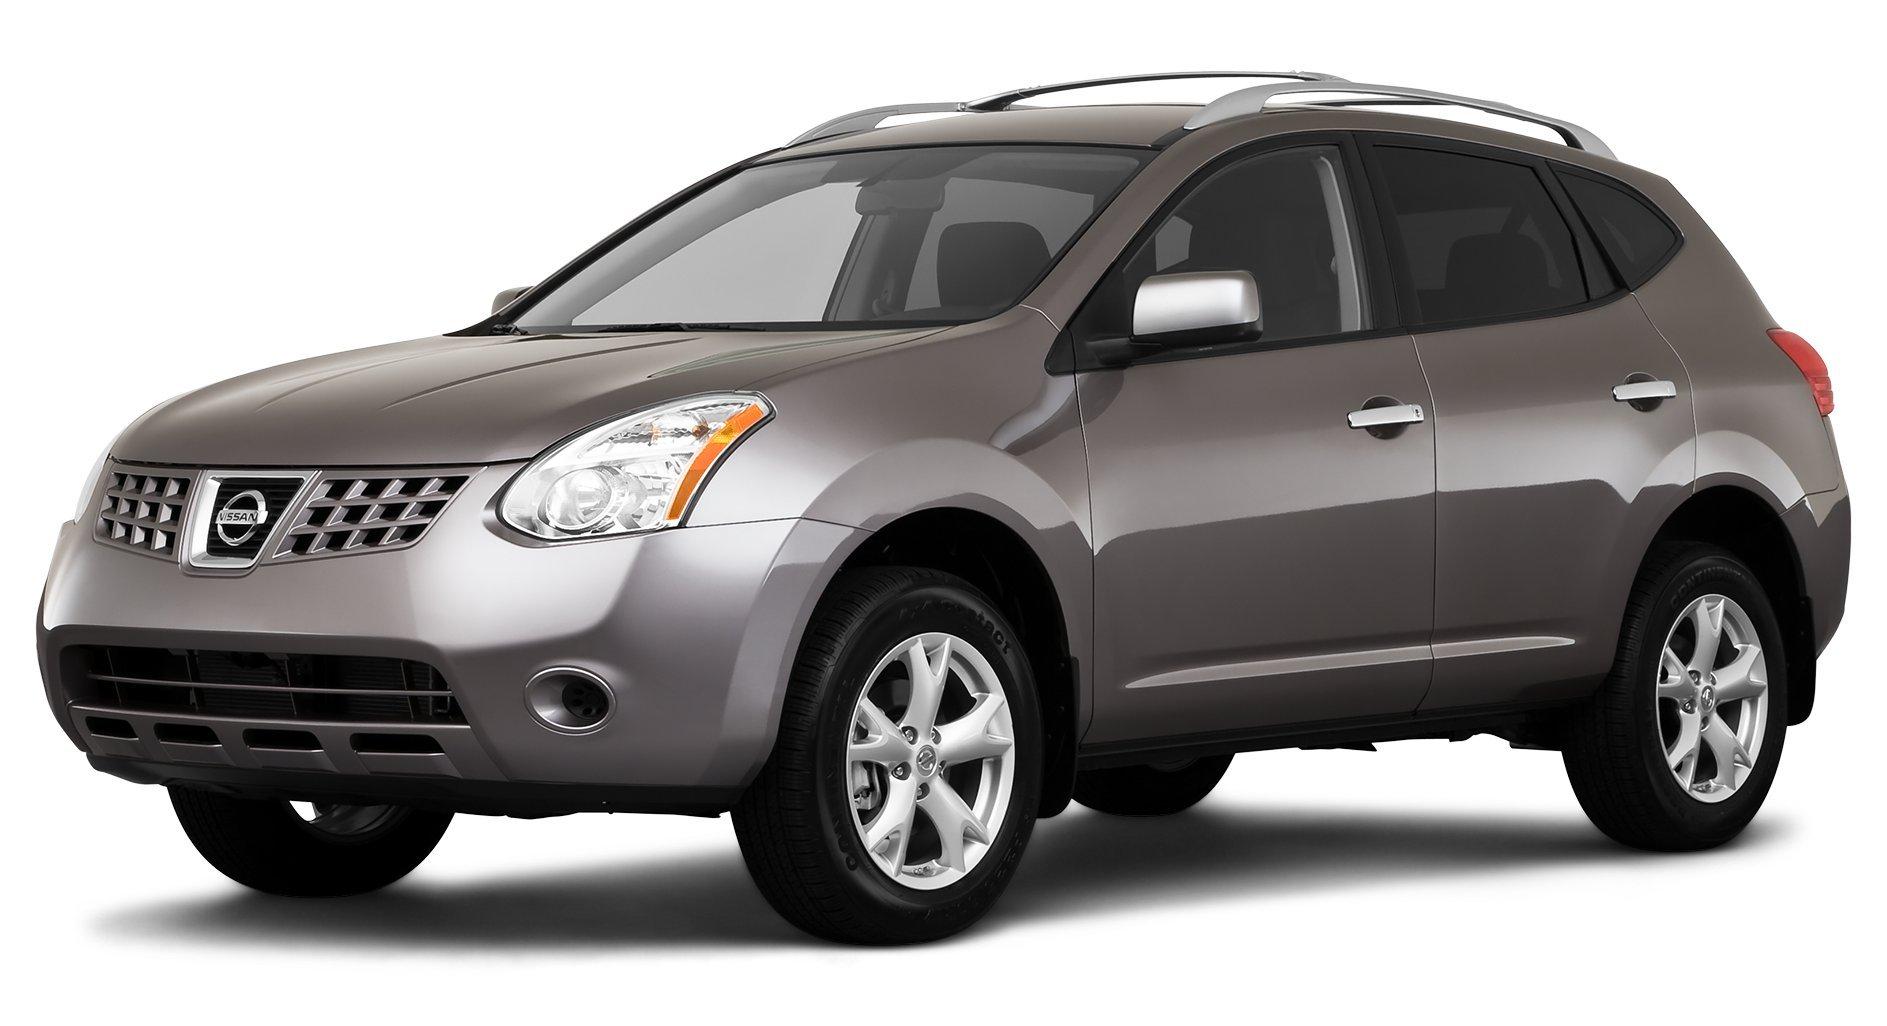 2010 Mitsubishi Outlander Reviews Images And Specs Kia Sportage Fuse Box 2012 Nissan Rogue S Front Wheel Drive 4 Door